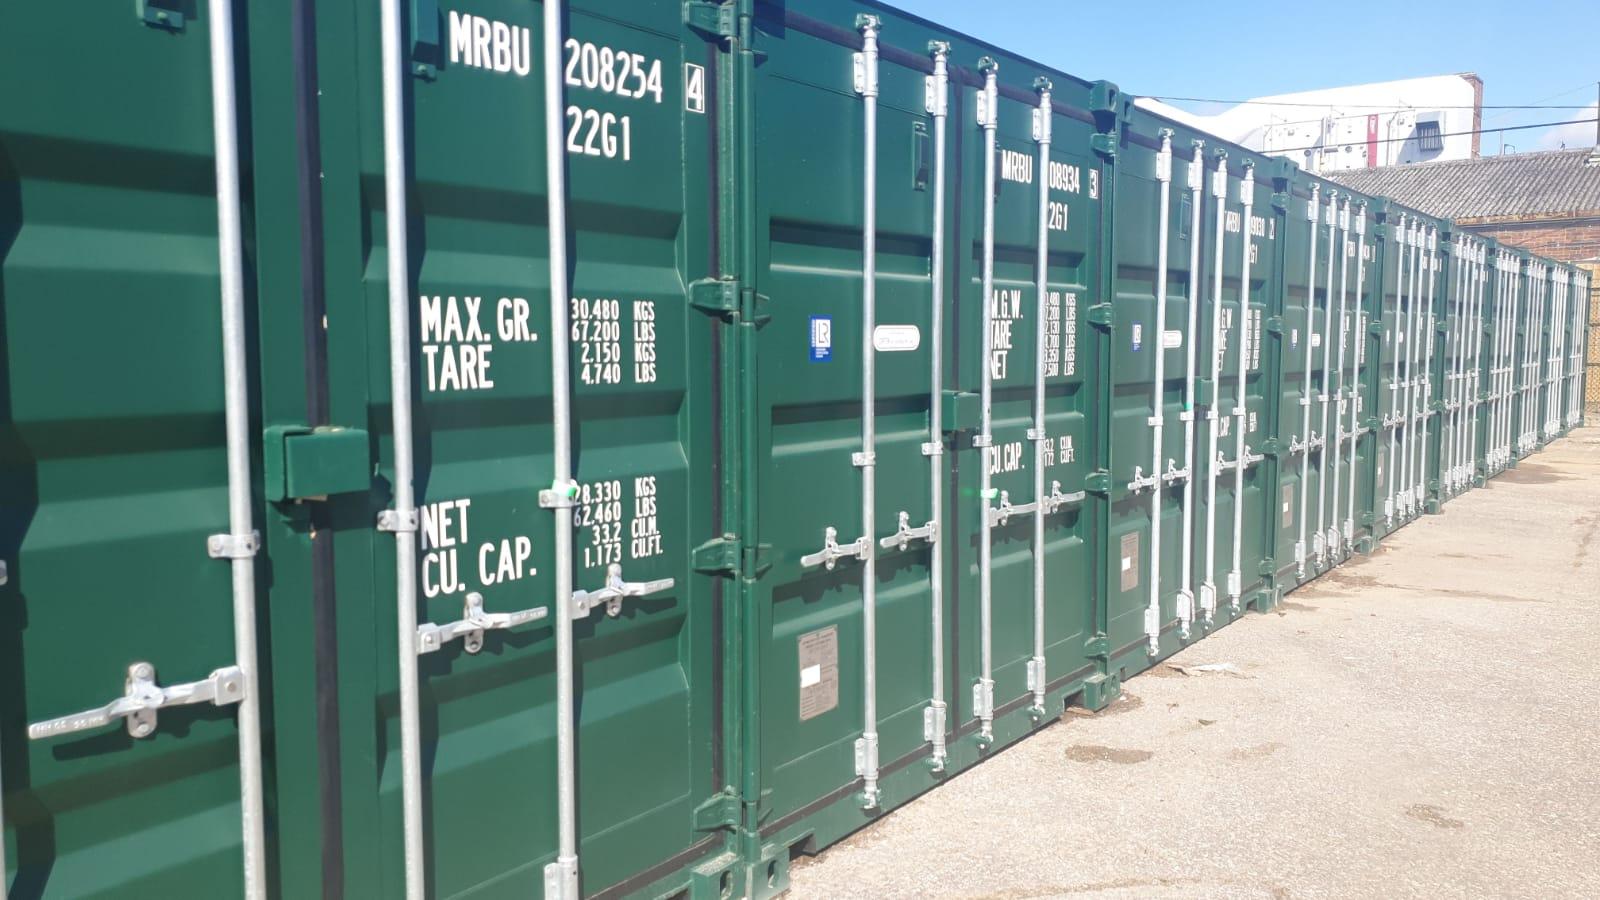 Safe & Dry Storage a storage company in 38-40 Sterte Avenue West, Poole, UK